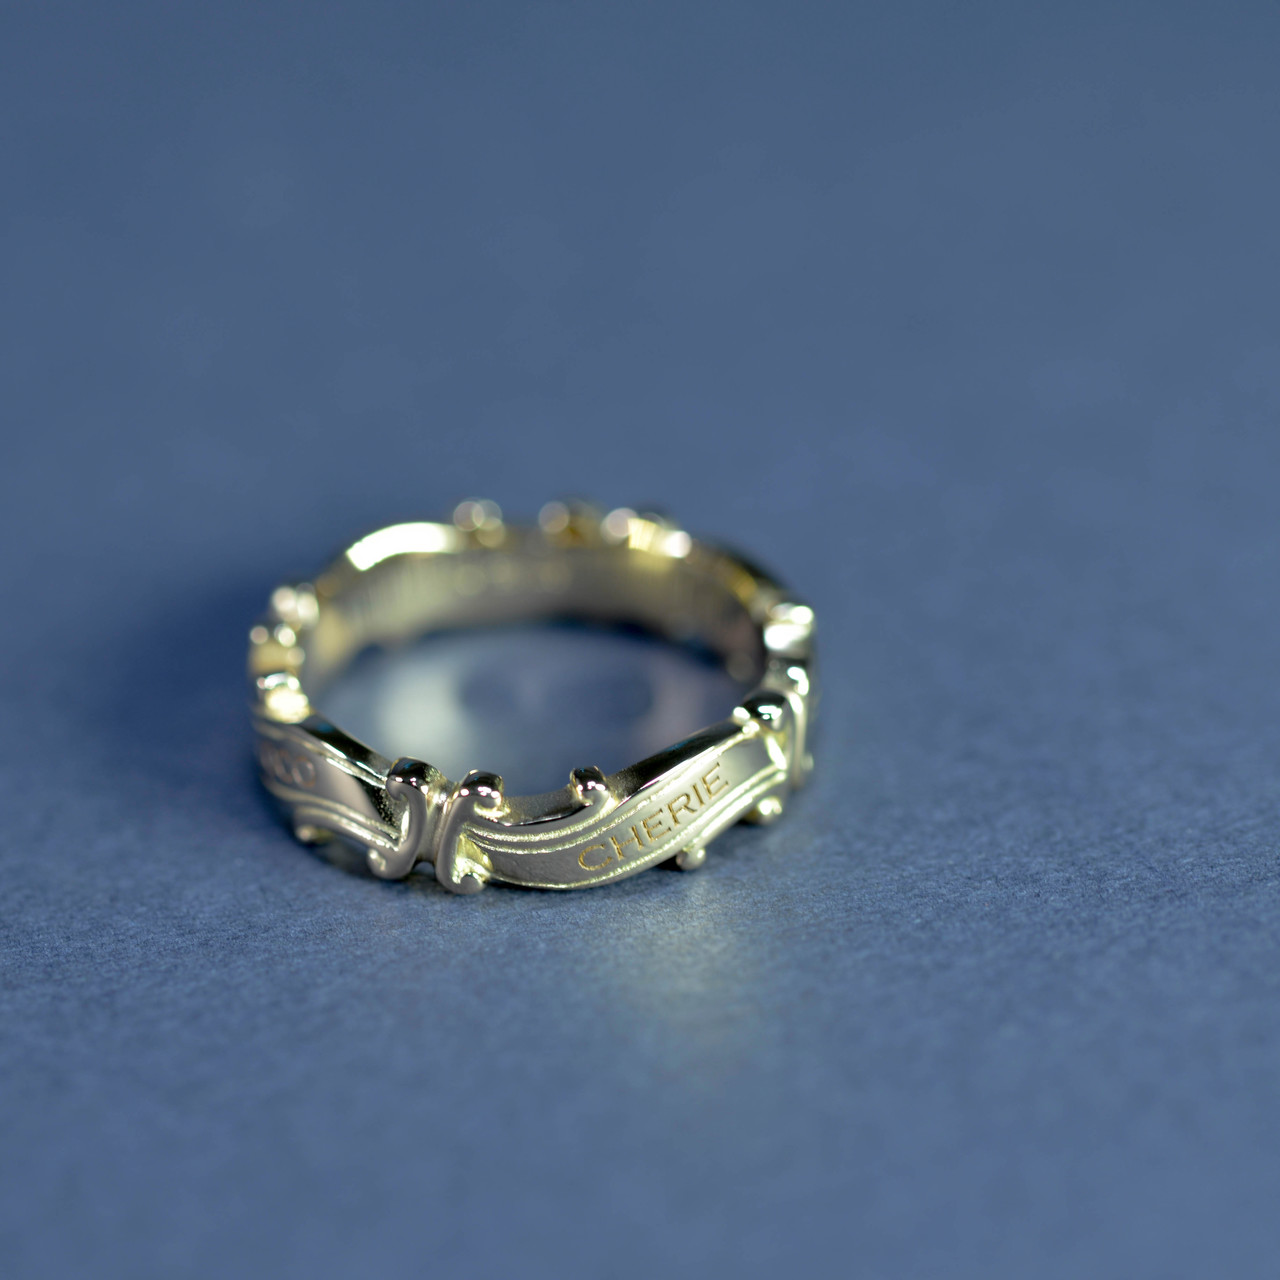 Promesse Ring 4ヵ所 メッセージ変更